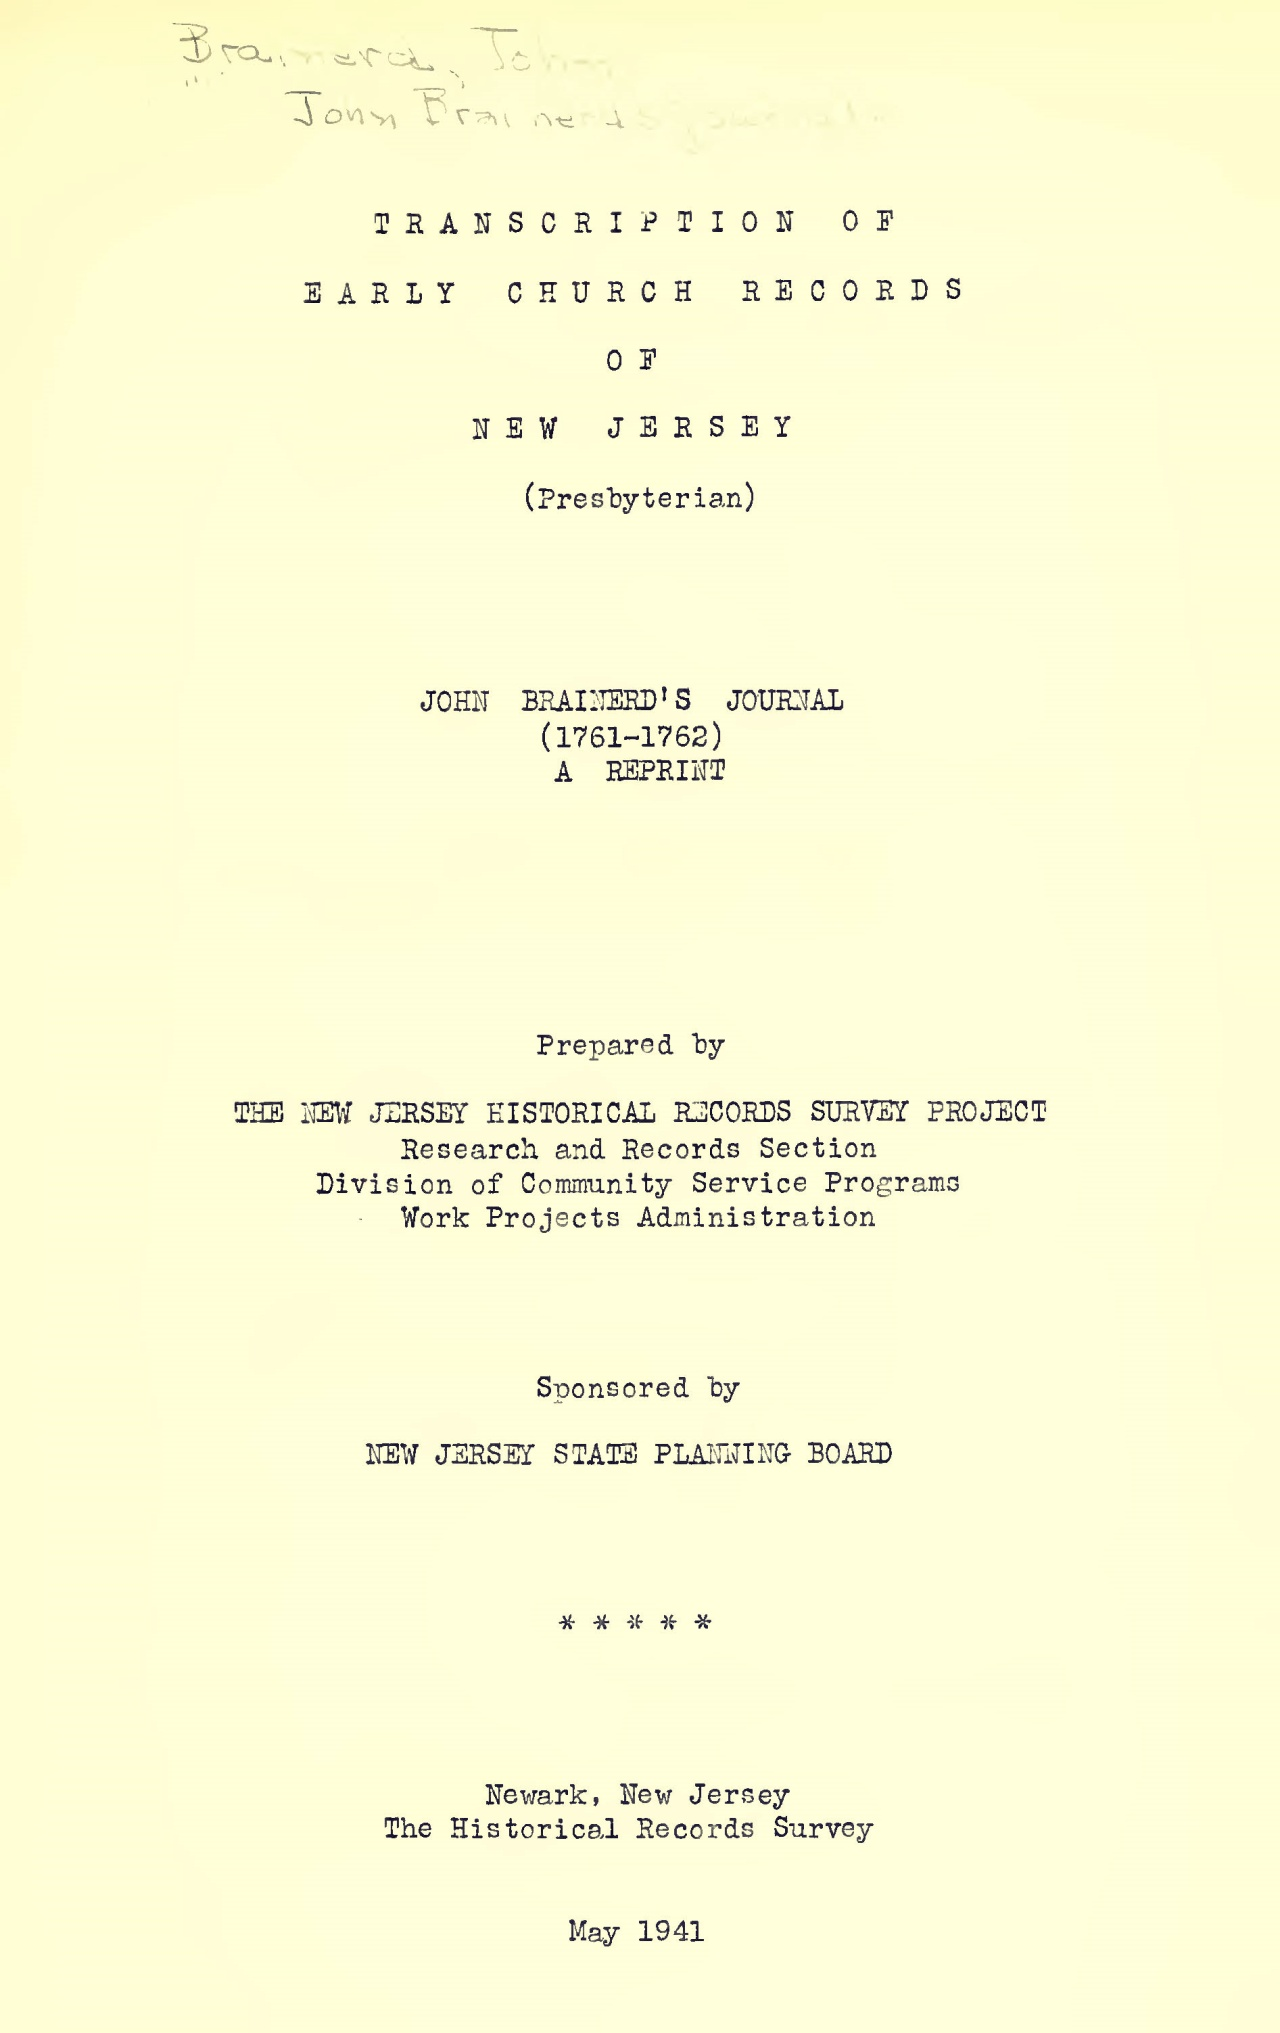 Brainerd, John, Journal Title Page.jpg